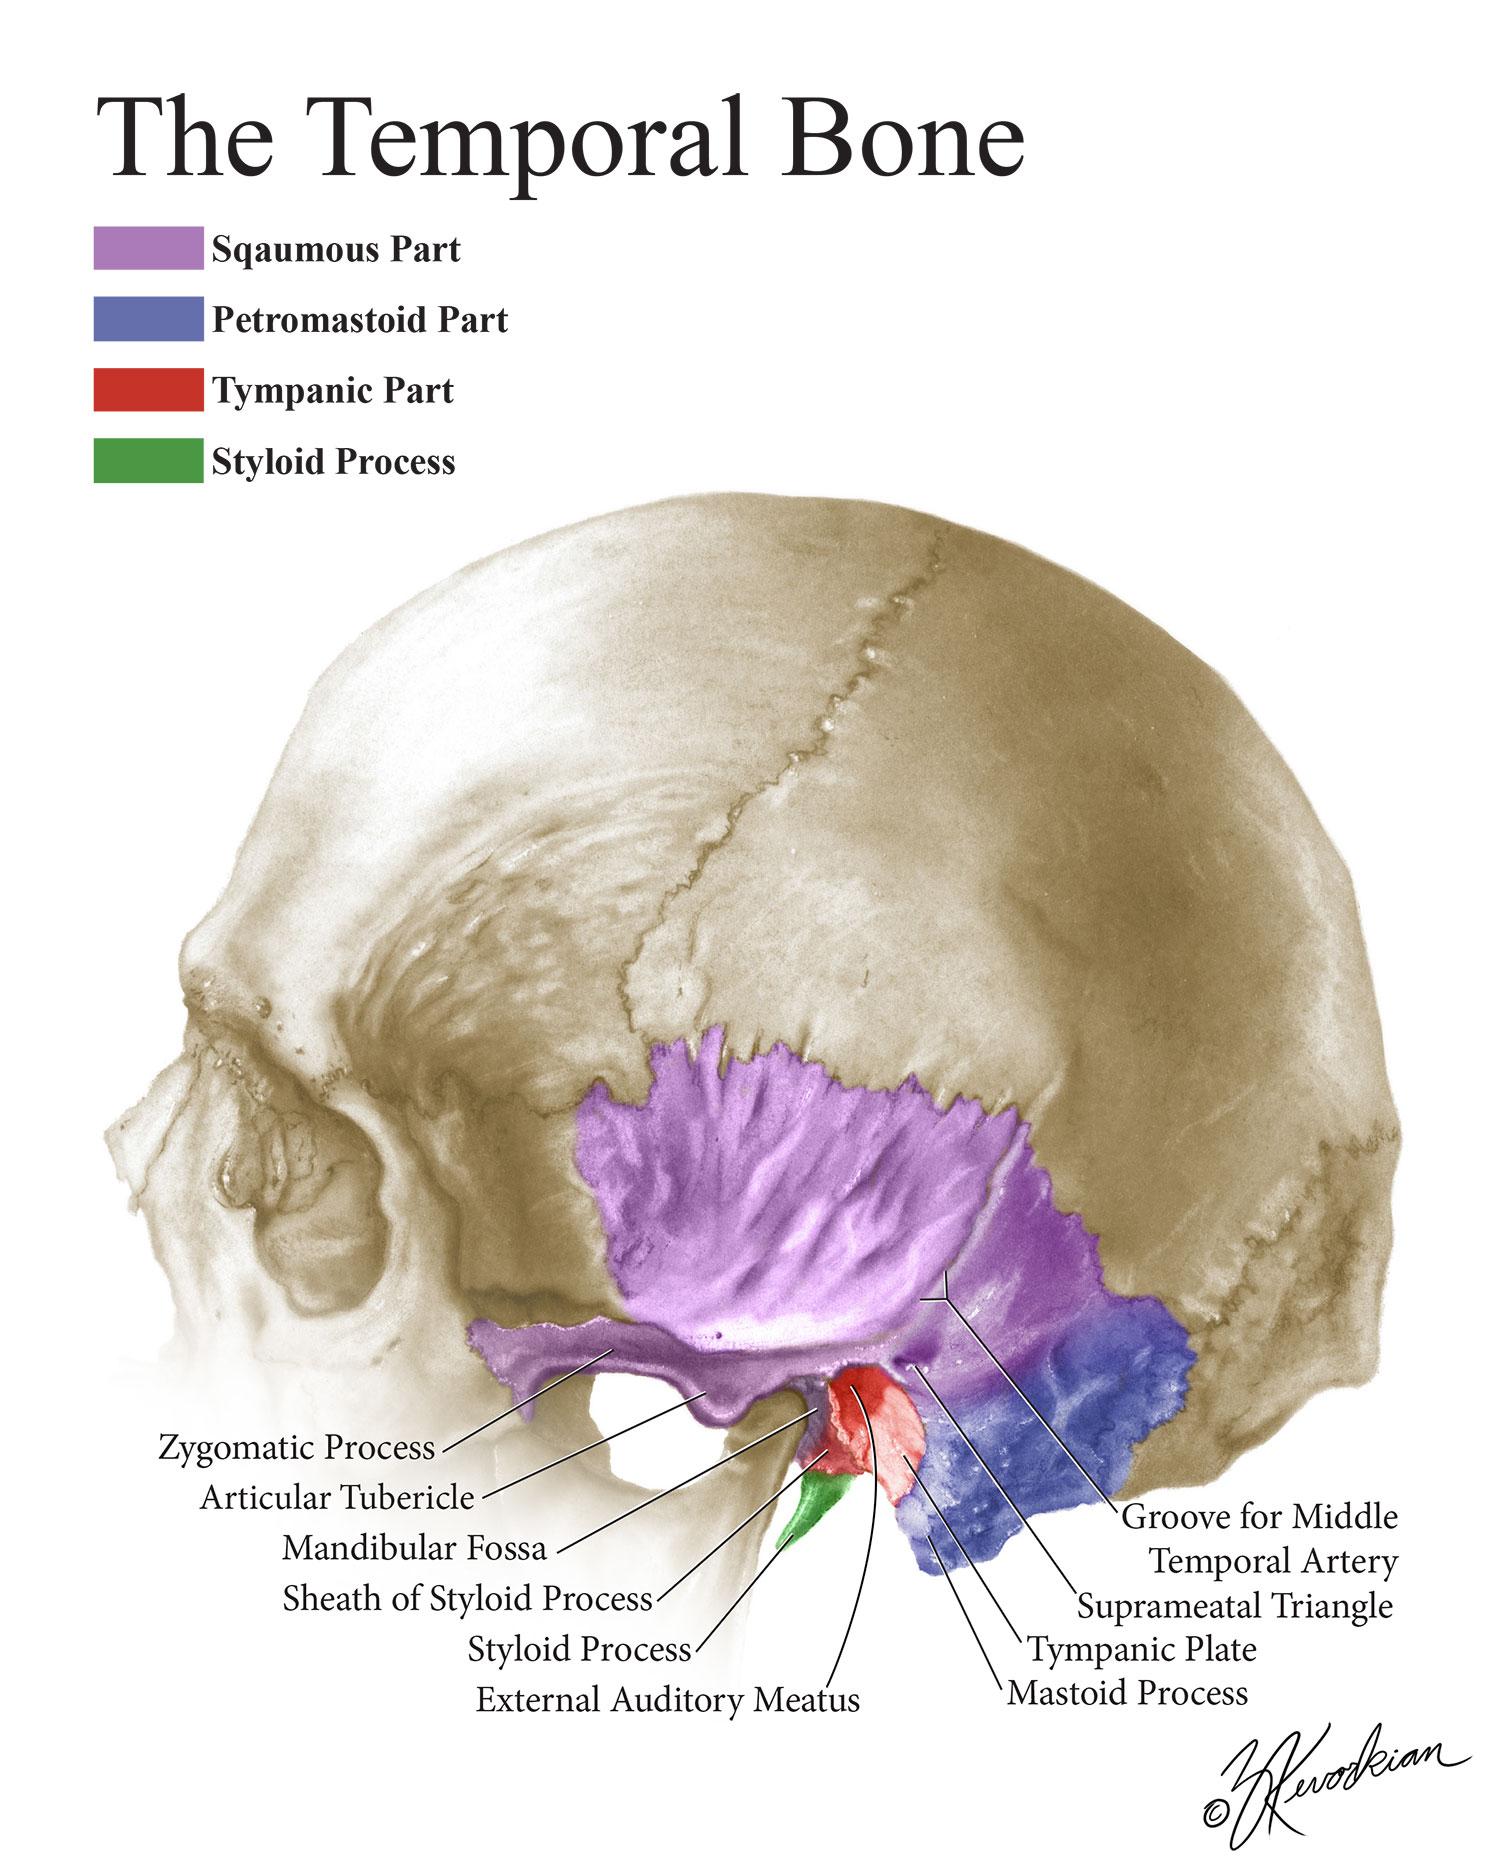 Kevorkian_Color-Skull.jpg